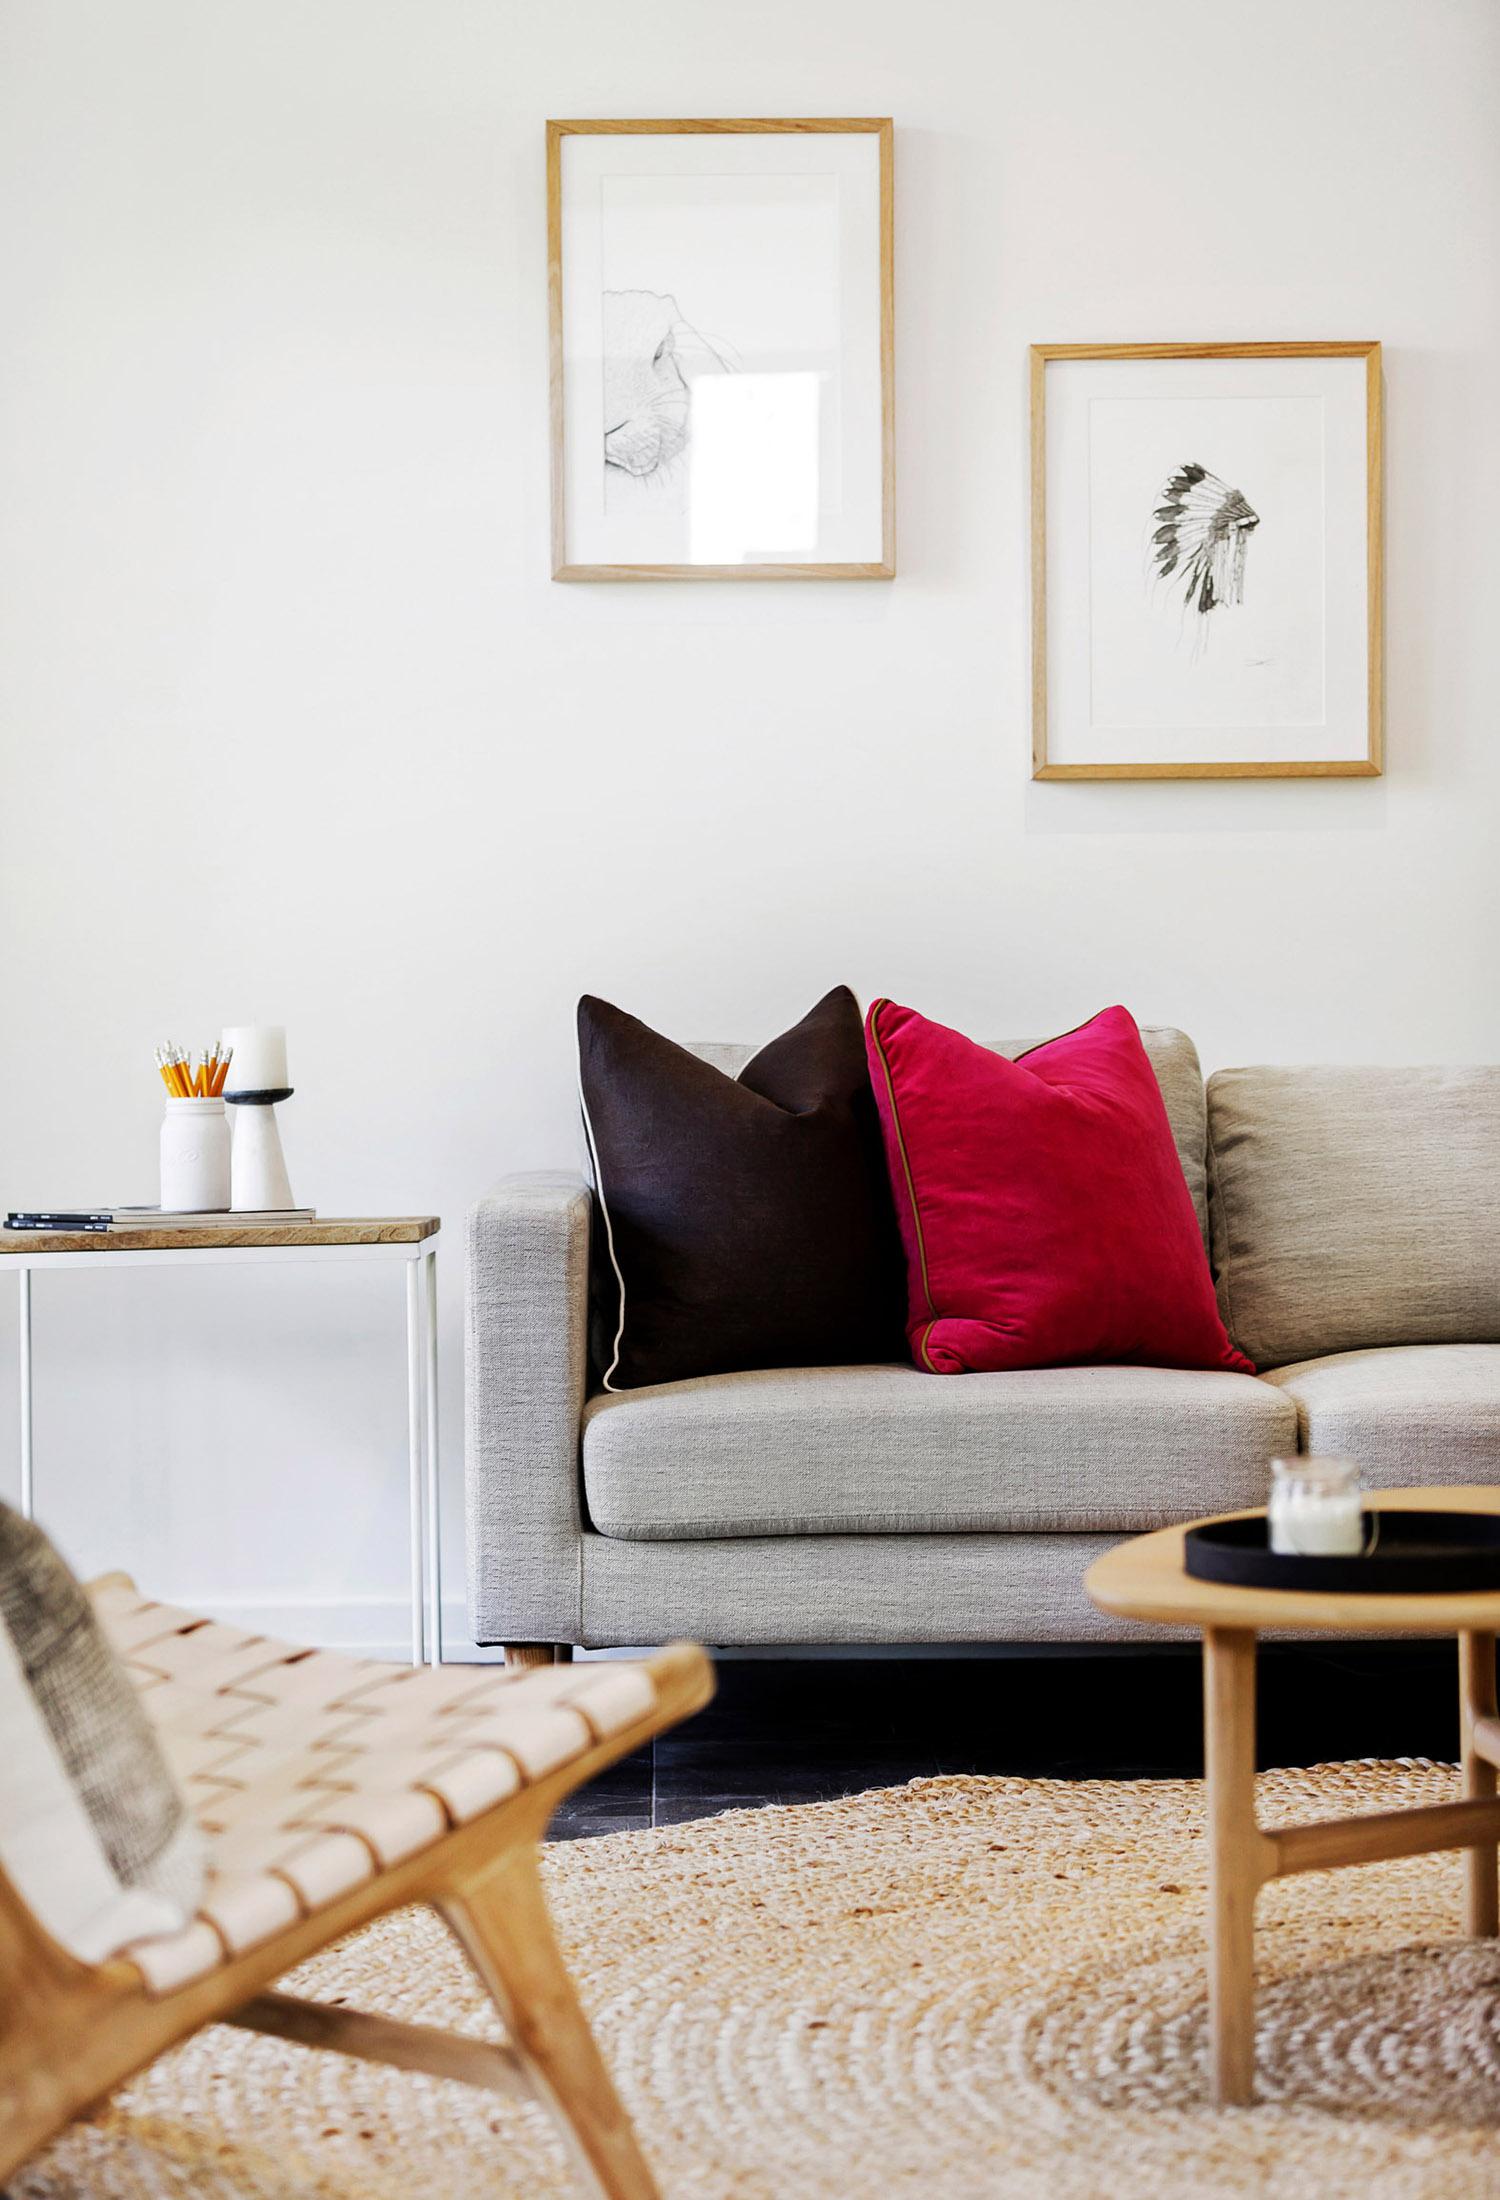 Maison ouverte_miluQi Studio Montpellier8.jpg